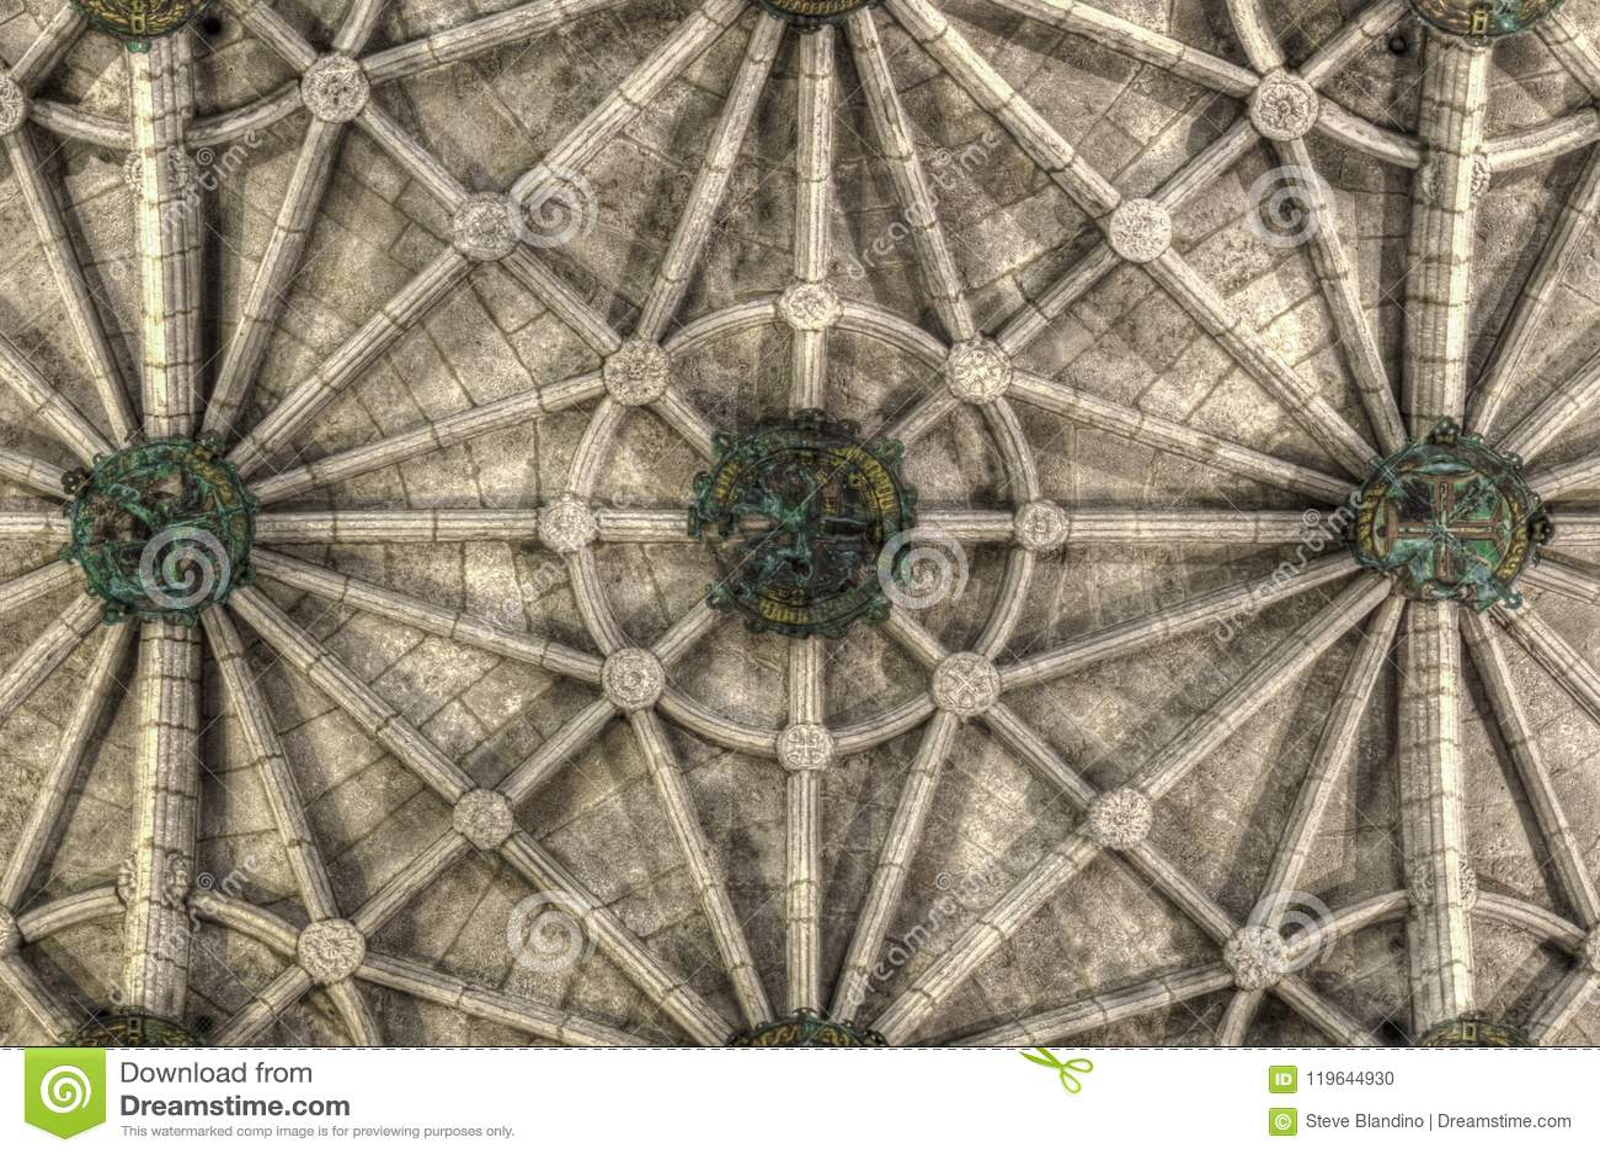 Ribbed ceiling of Jeronimos Monastery Church of Santa Maria in Lisbon